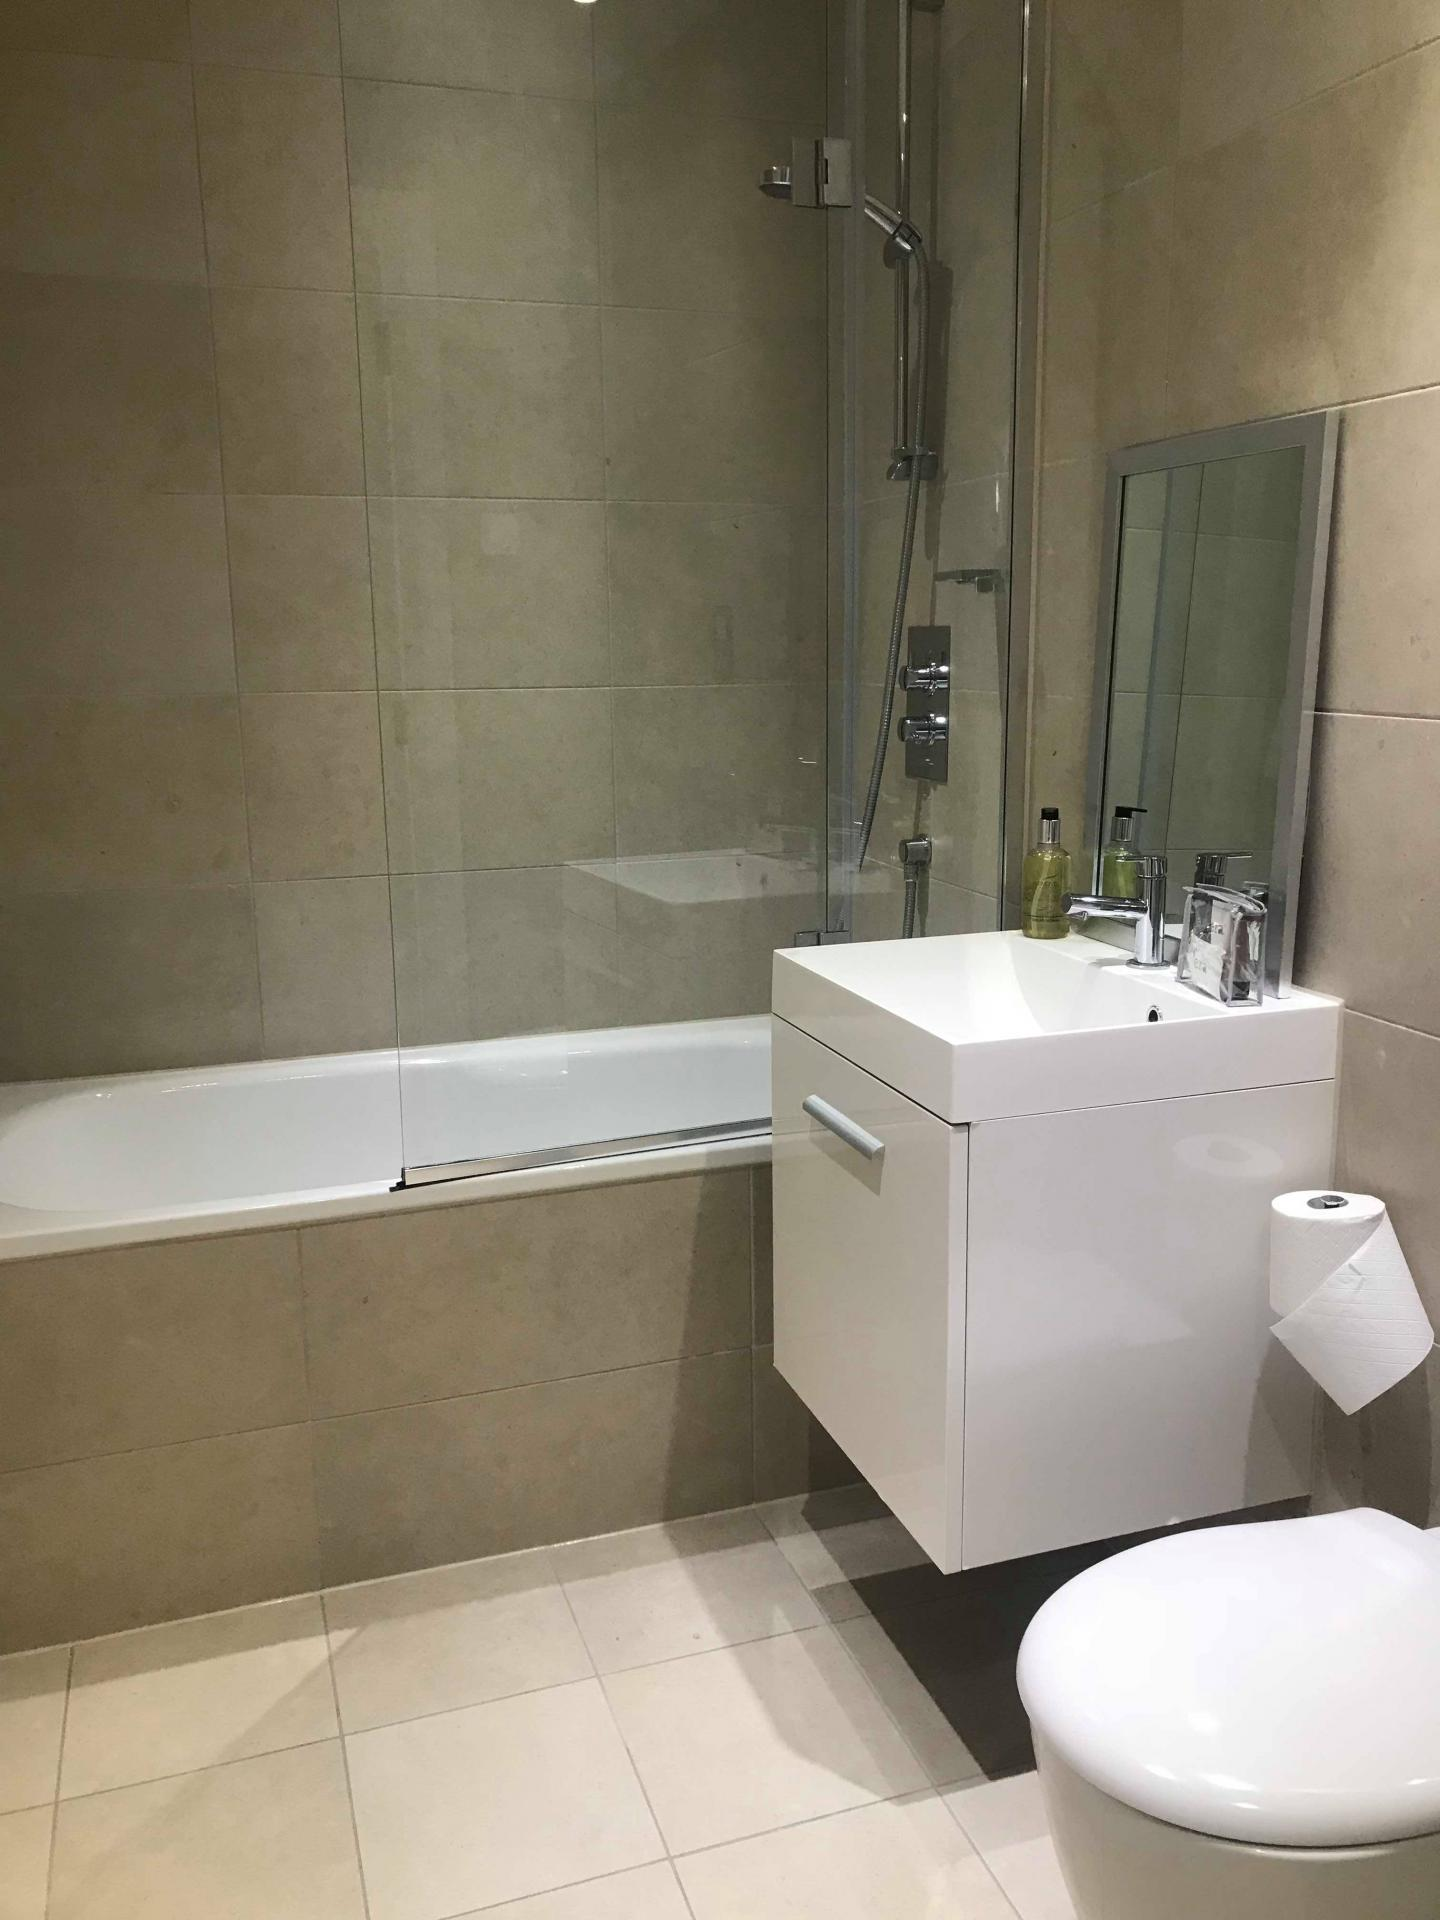 Sink at Ocean Village Serviced Apartments, Ocean Village, Southampton